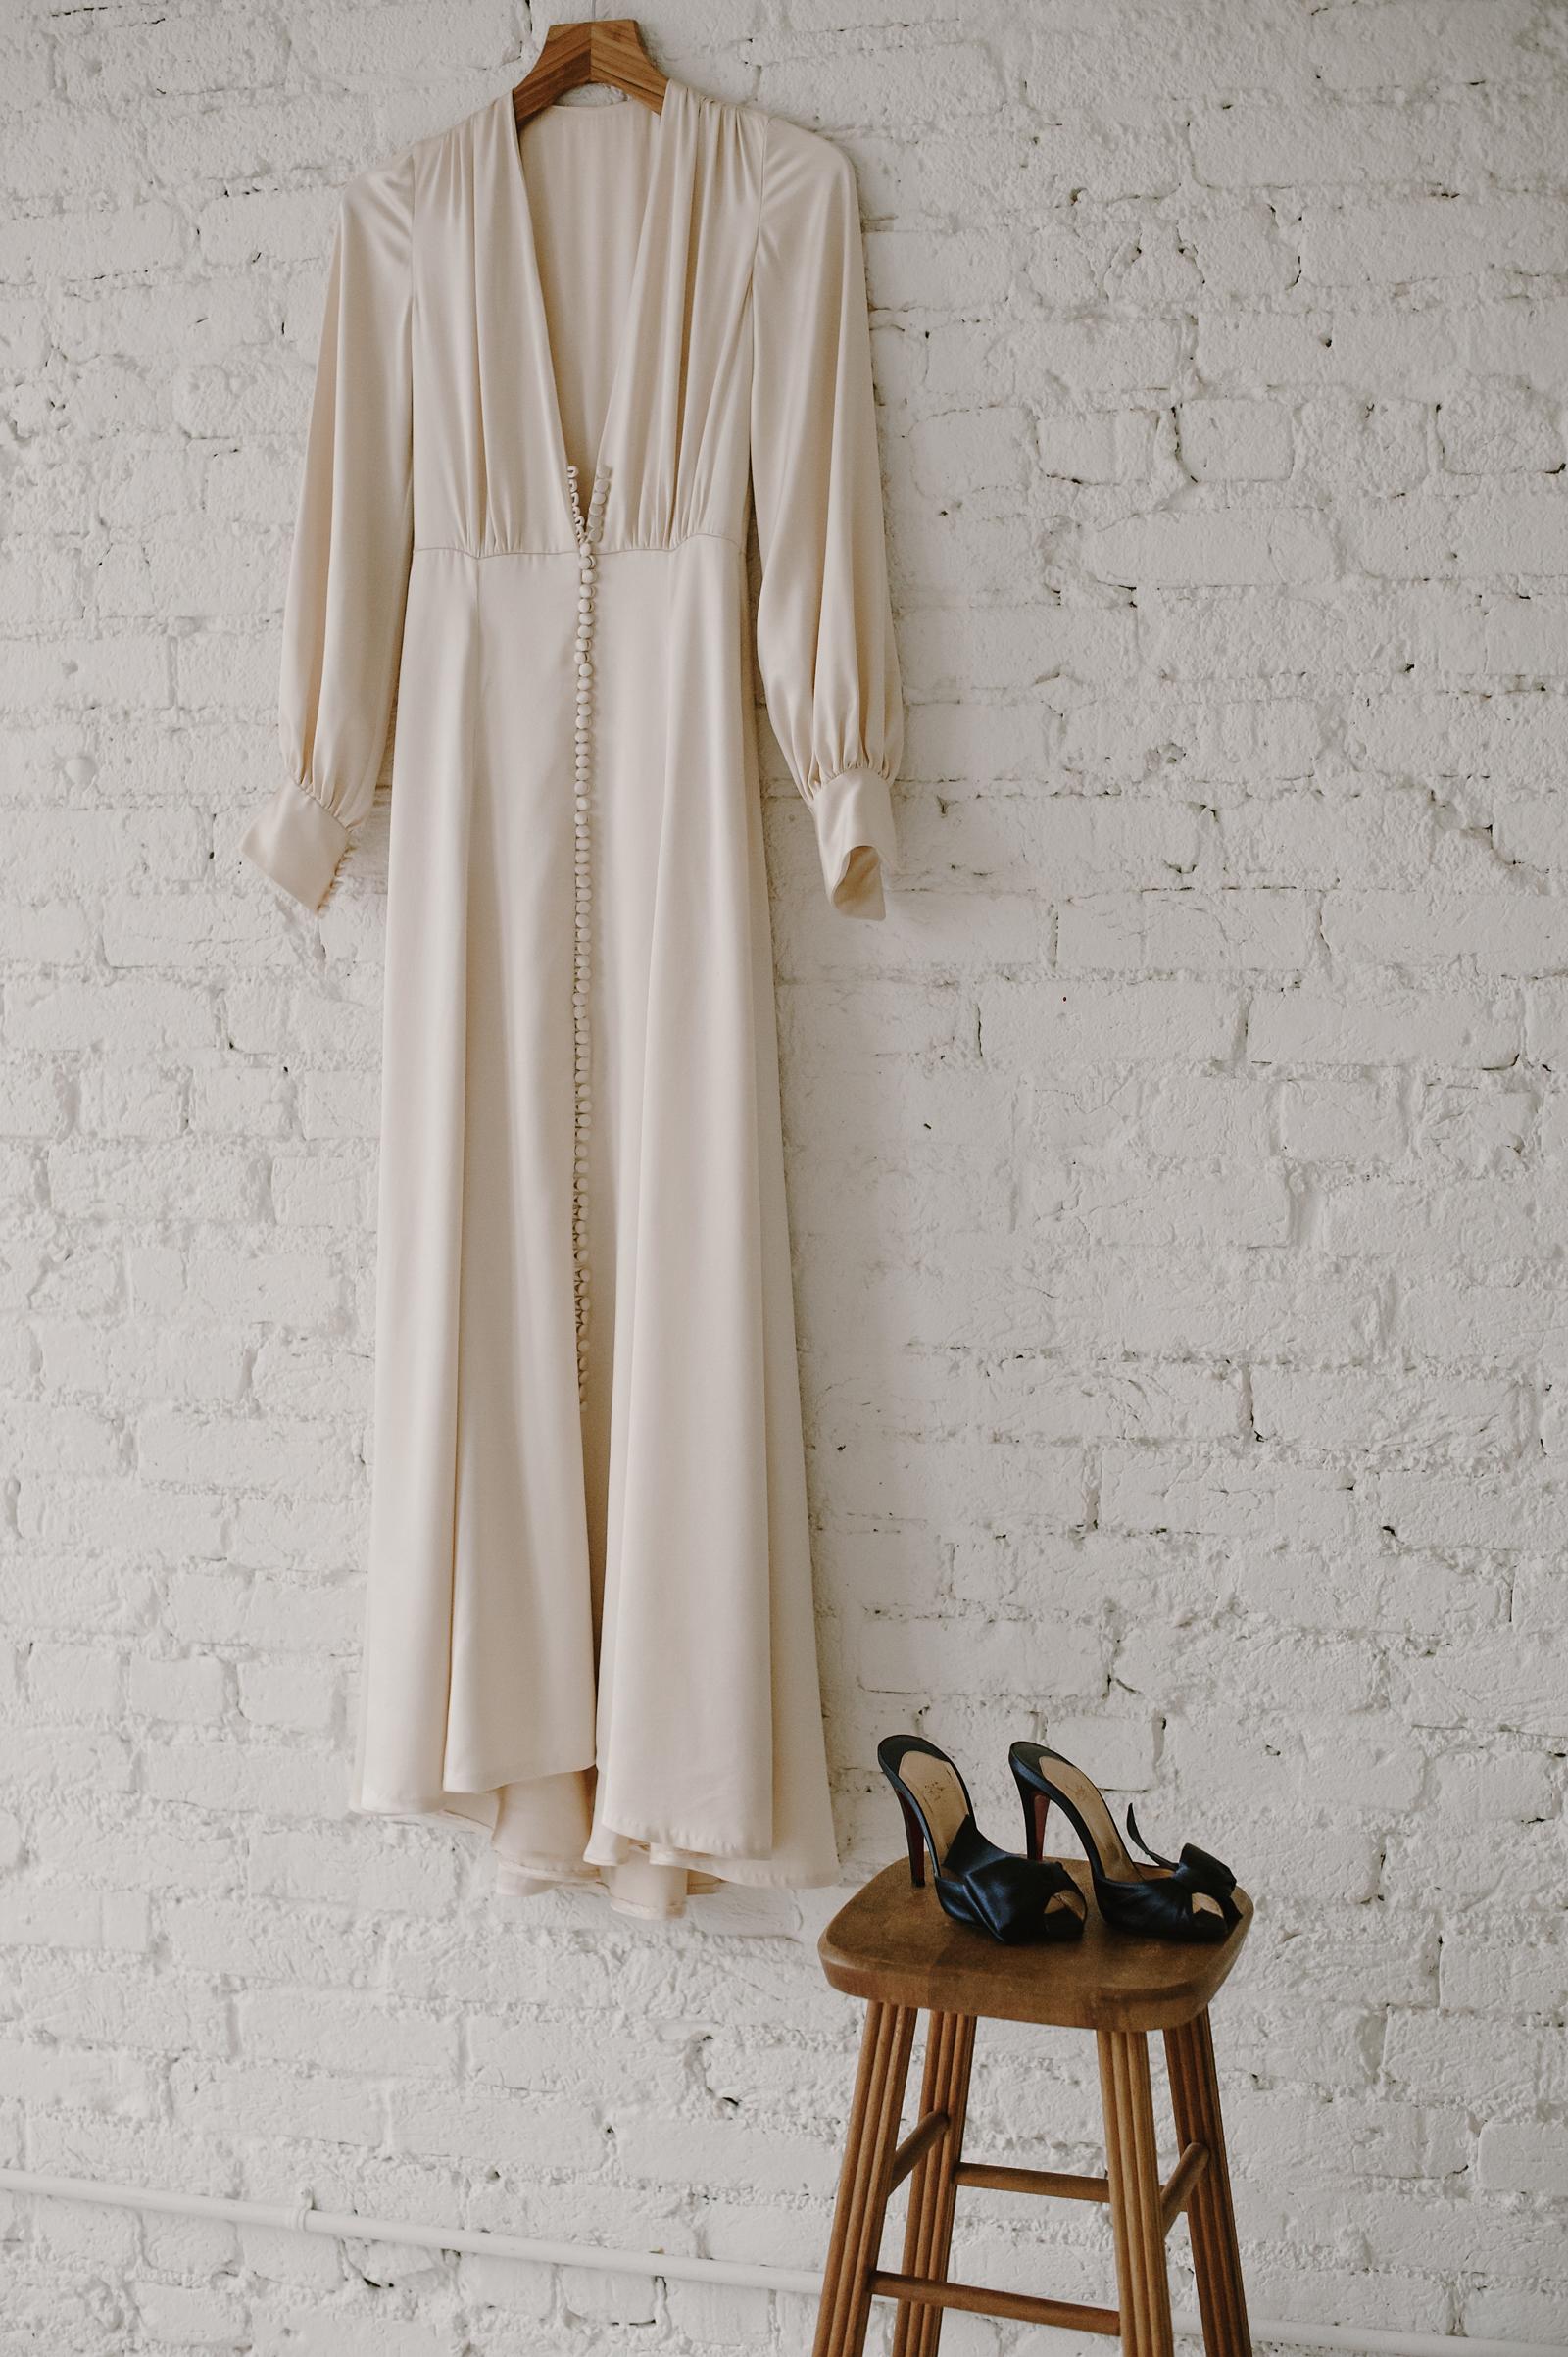 kristenmarieparker_tacoma_conservatory_warehouse_wedding005.JPG